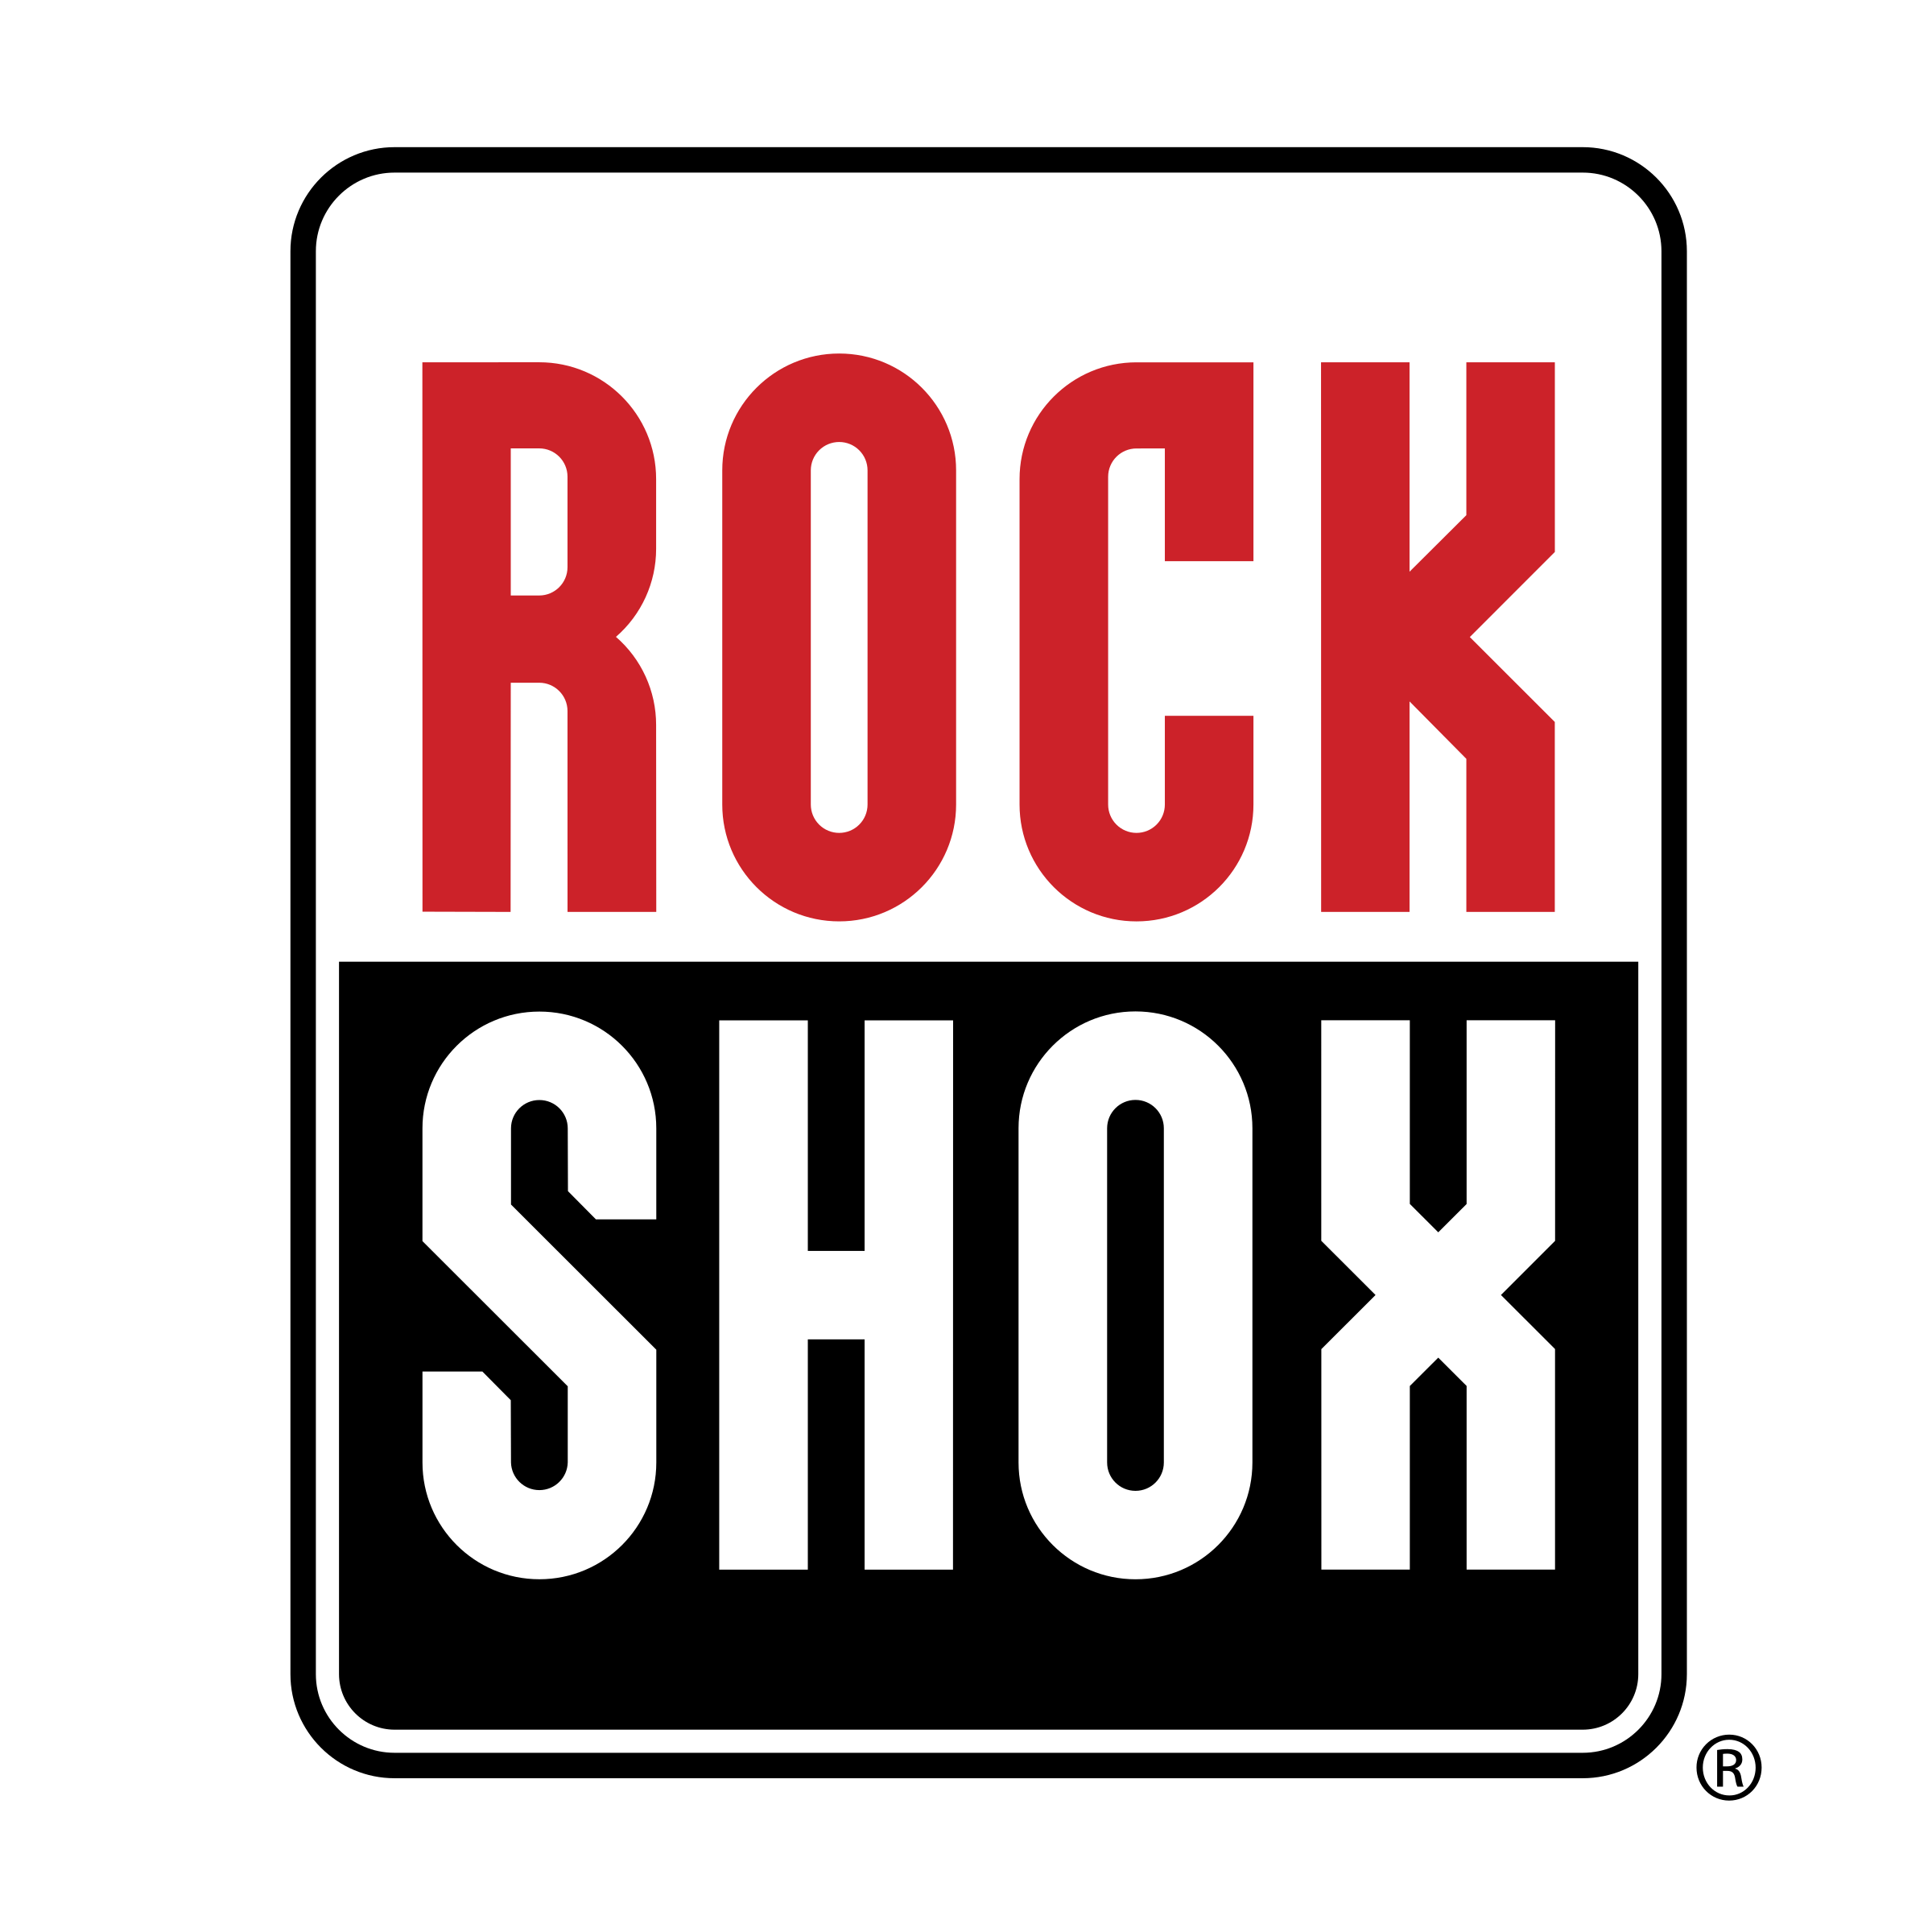 rockshox-logo-png-transparent.png